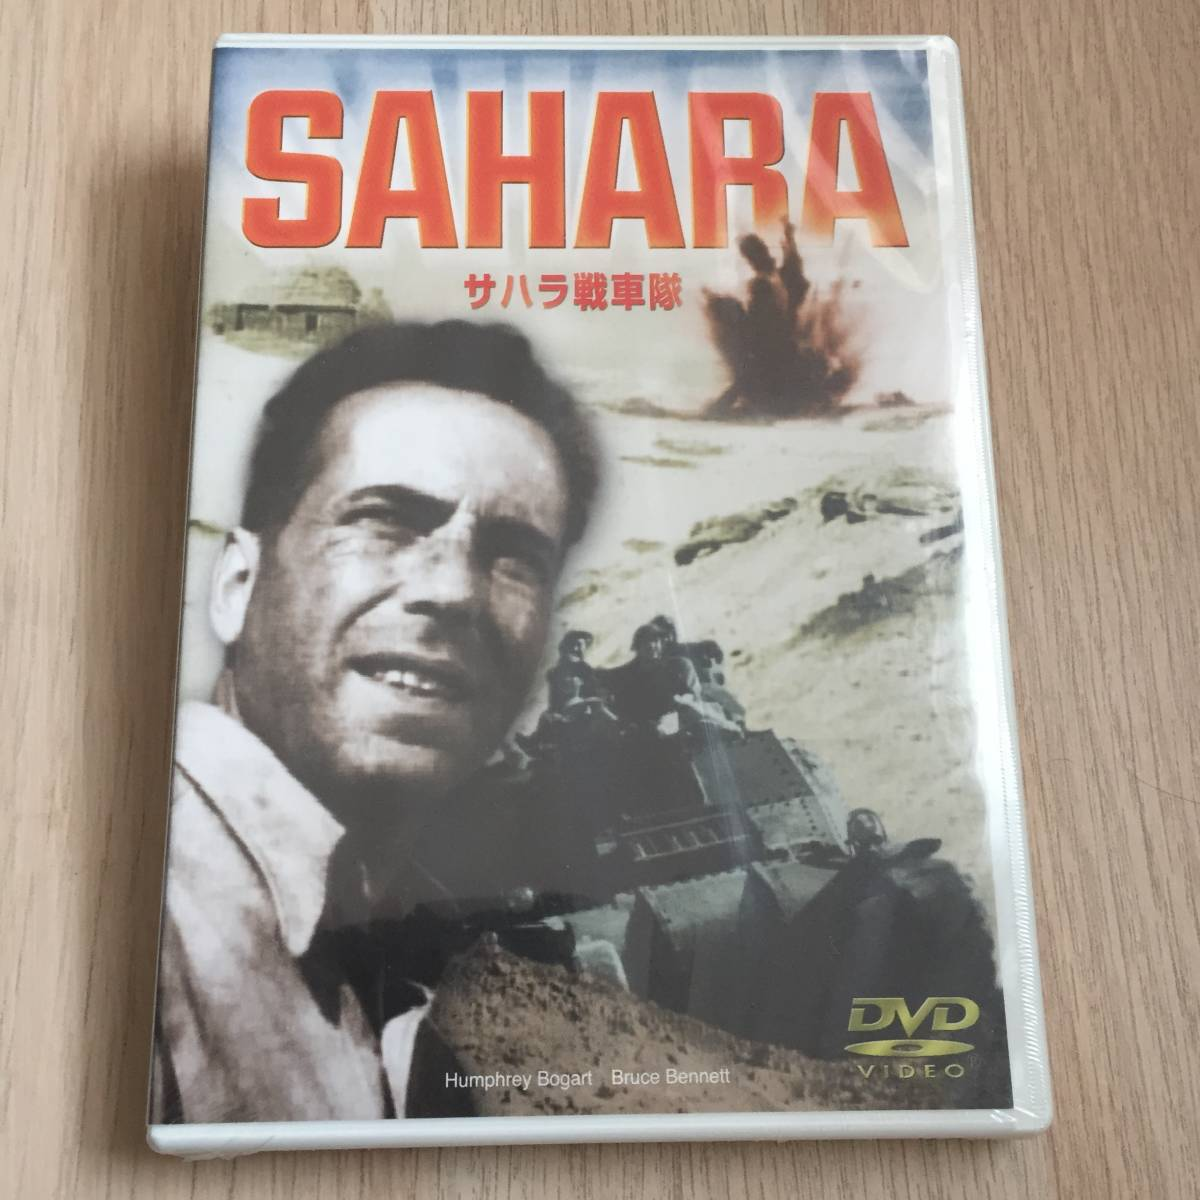 SAHARA サハラ戦車隊 / ハンフリー・ボガート 映画 DVD★新品未開封_画像1